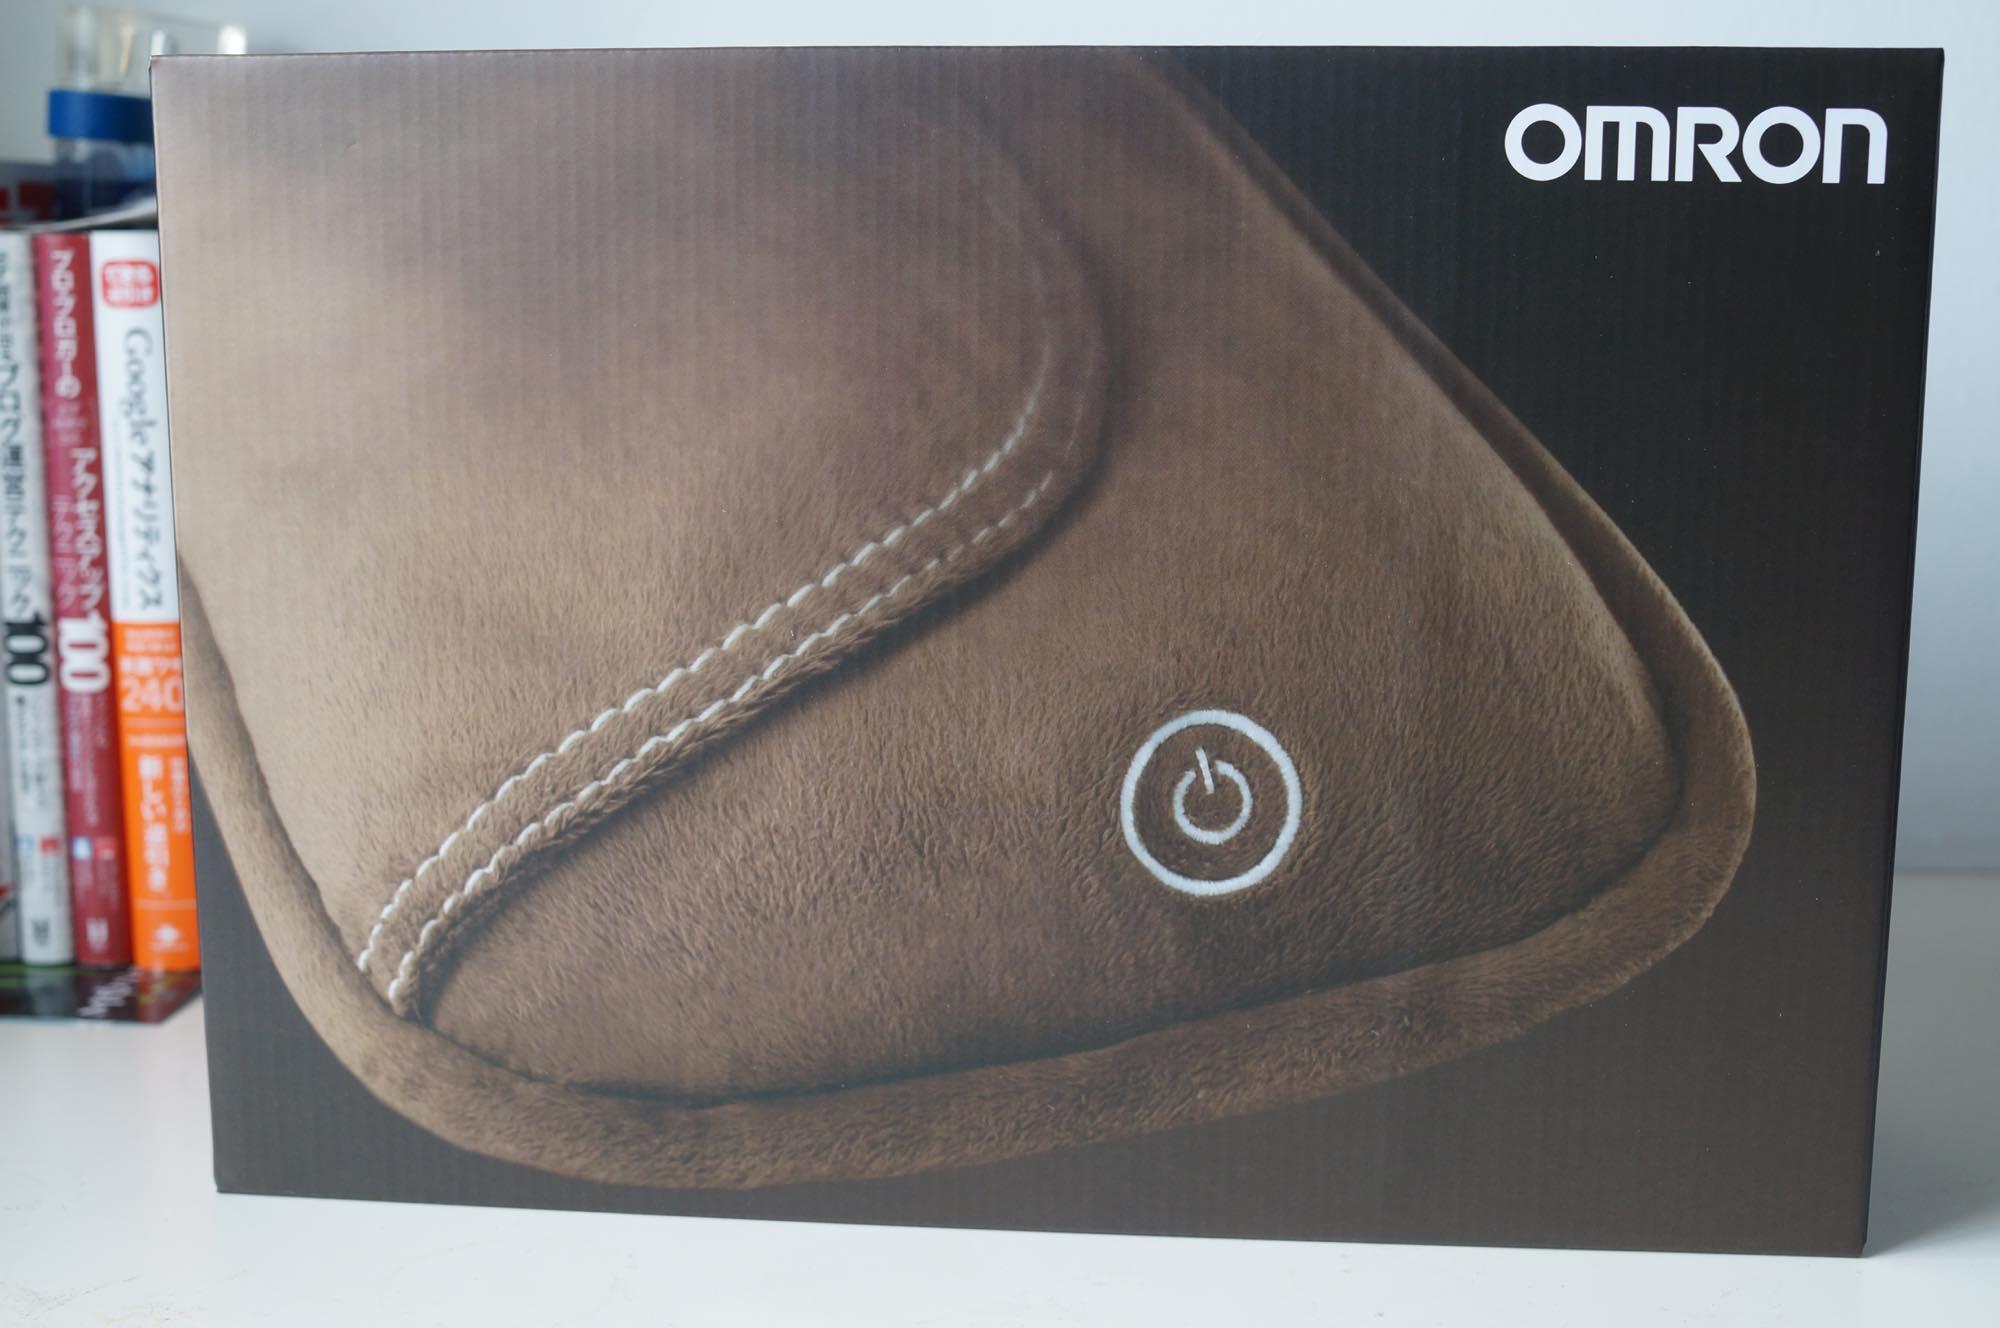 omron-massager1